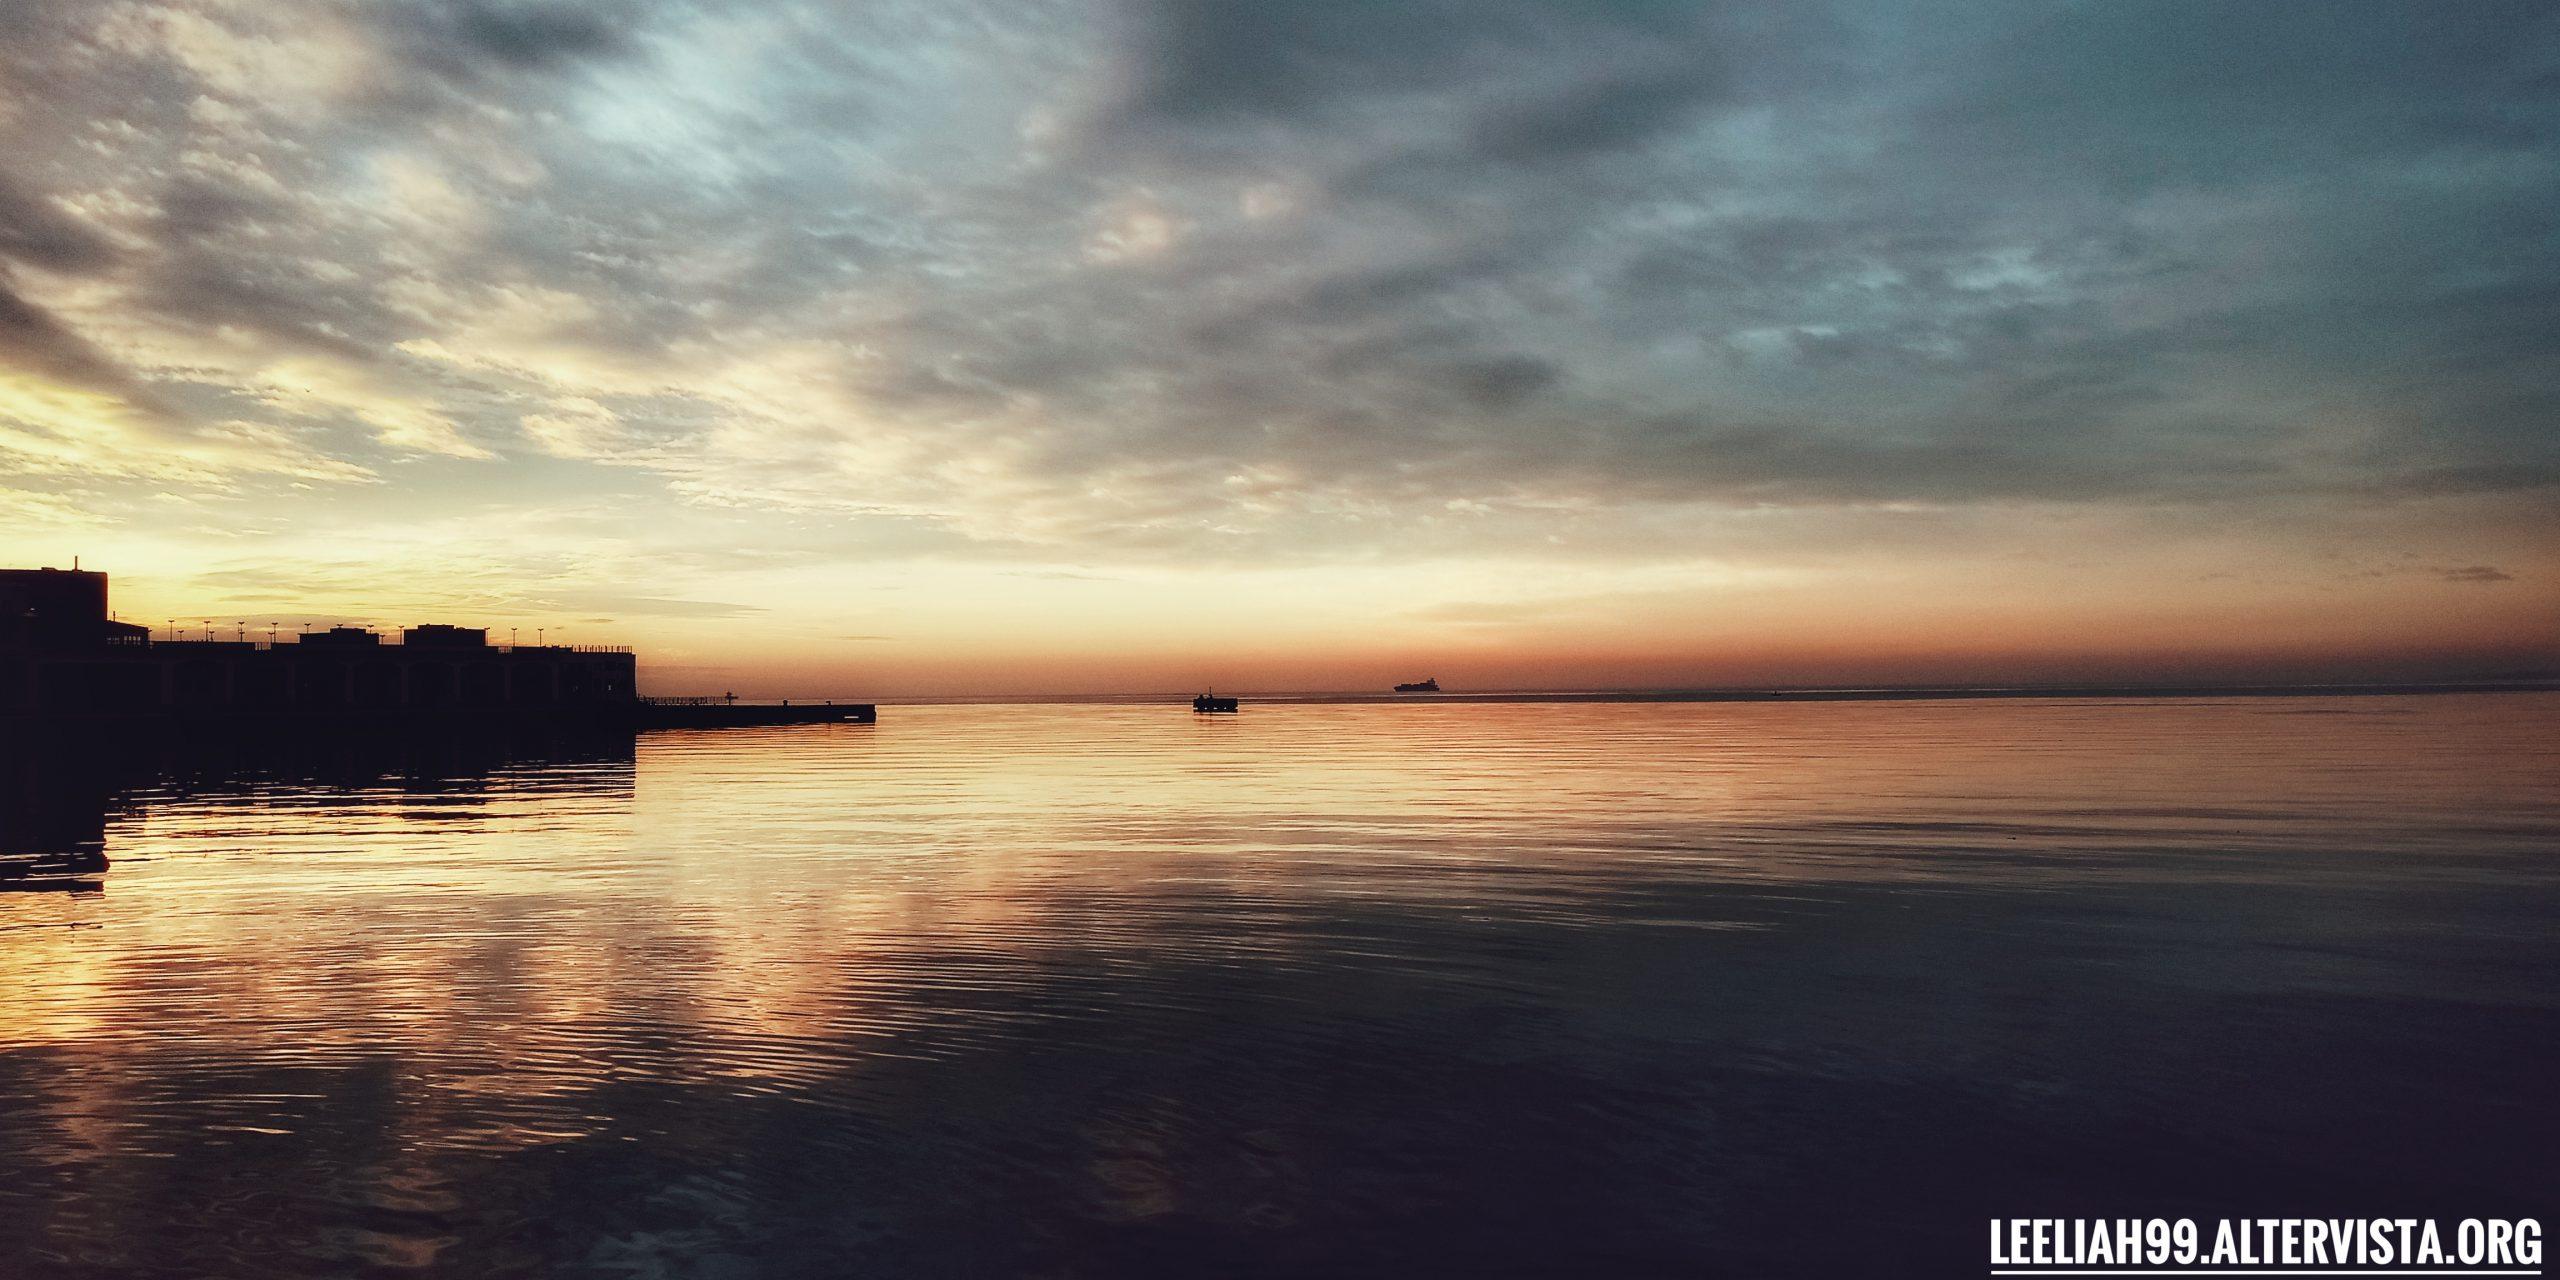 Penultimo tramonto del 2019 dal molo Audace © leeliah99.altervista.org